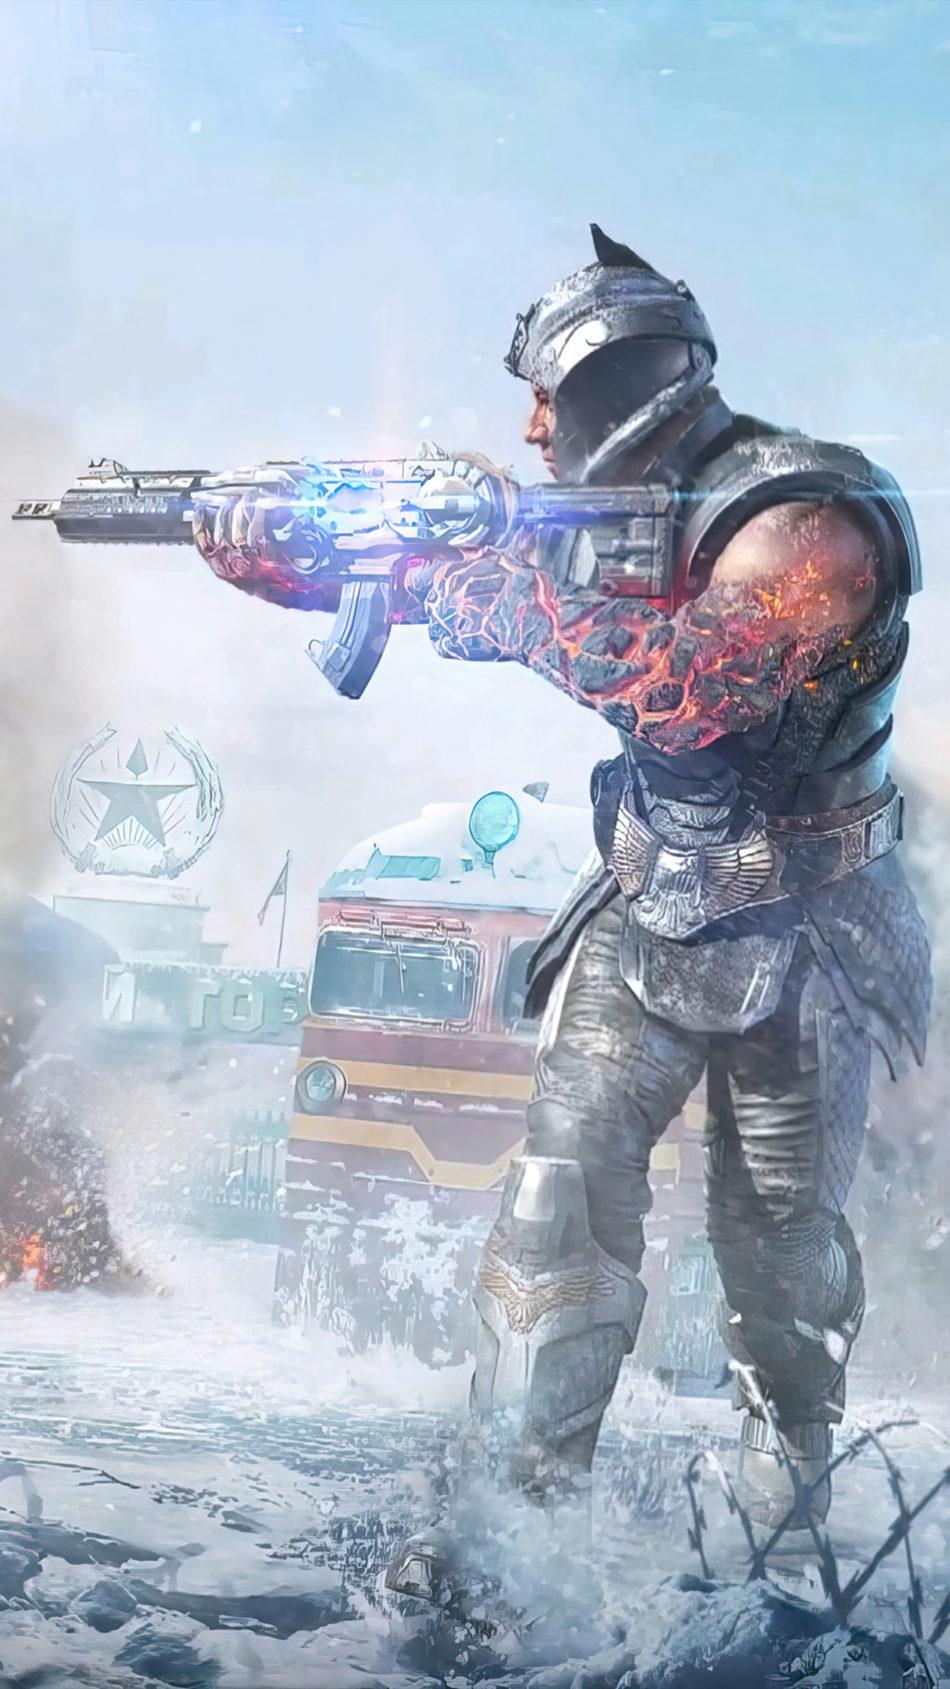 Call of Duty Mobile Season 13 Poster 4K Ultra HD Mobile Wallpaper